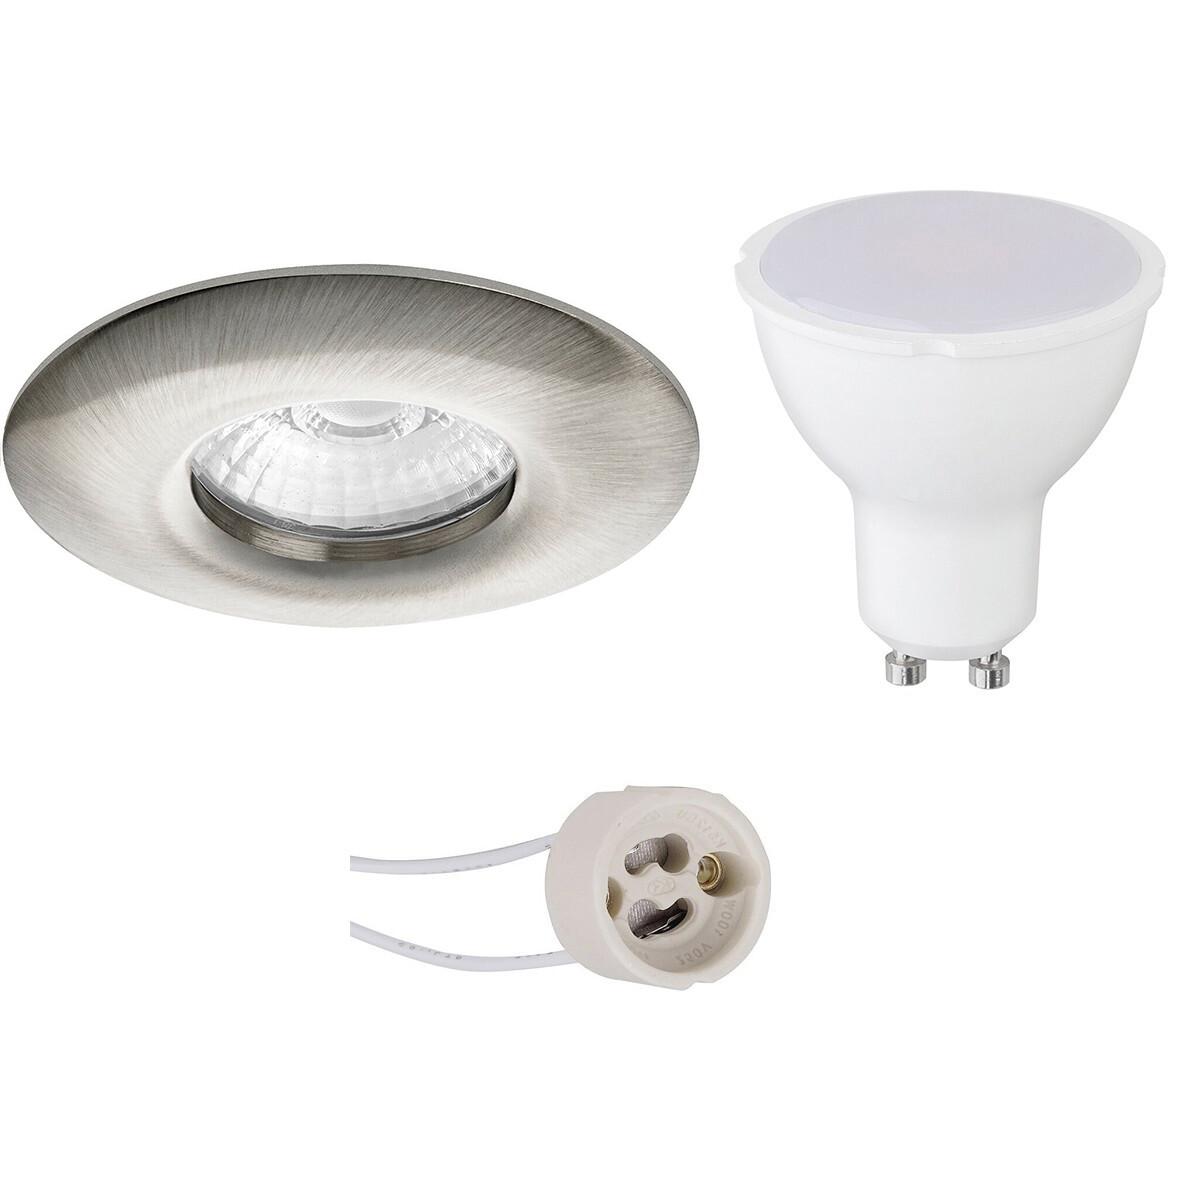 LED Spot Set - Pragmi Luno Pro - Waterdicht IP65 - GU10 Fitting - Inbouw Rond - Mat Nikkel - 4W - Na